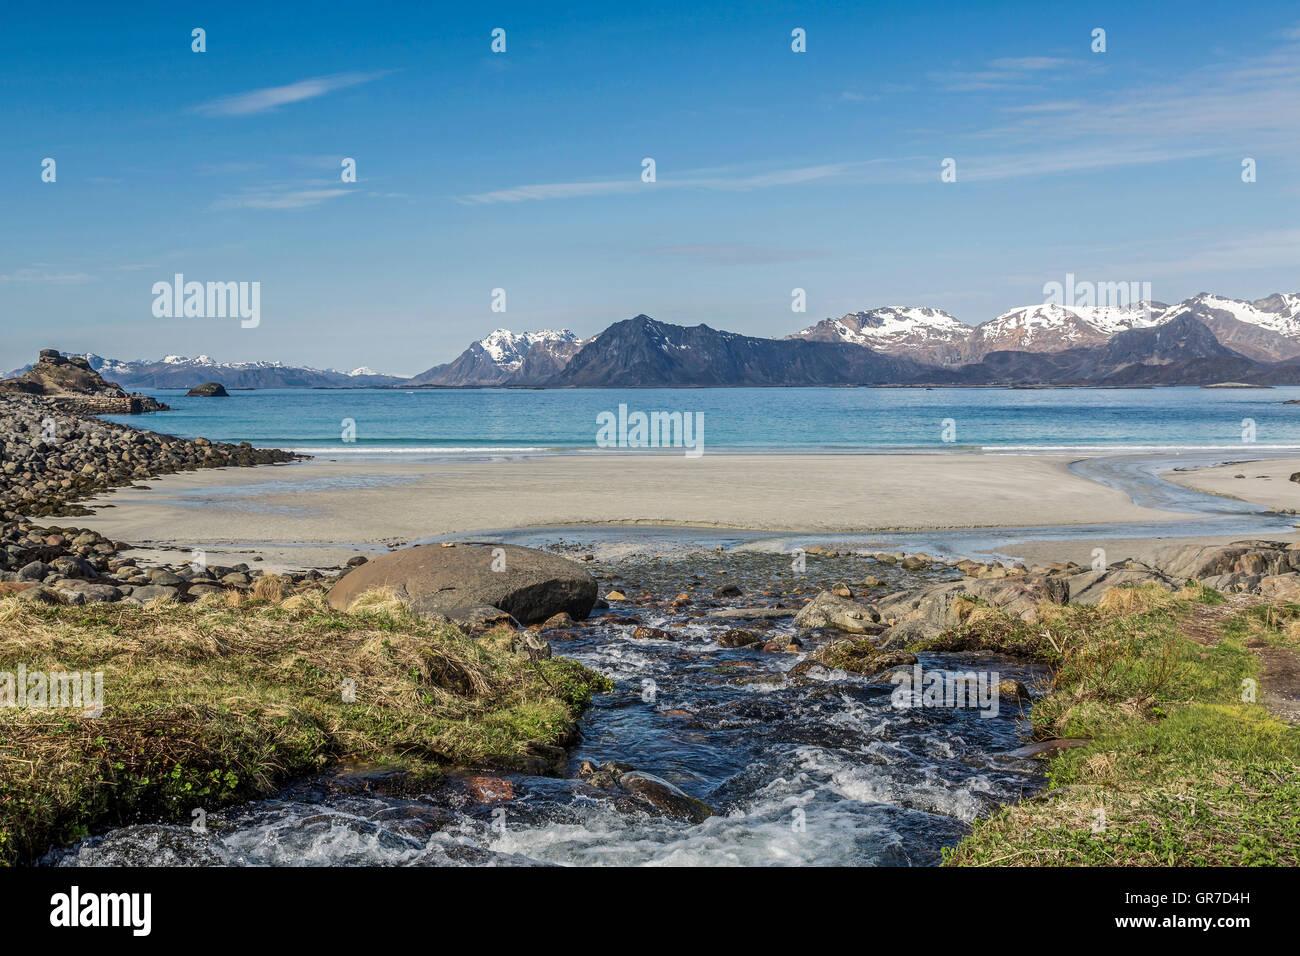 Torrent With Sandy Beach On The Lofoten Vestvagoy - Stock Image